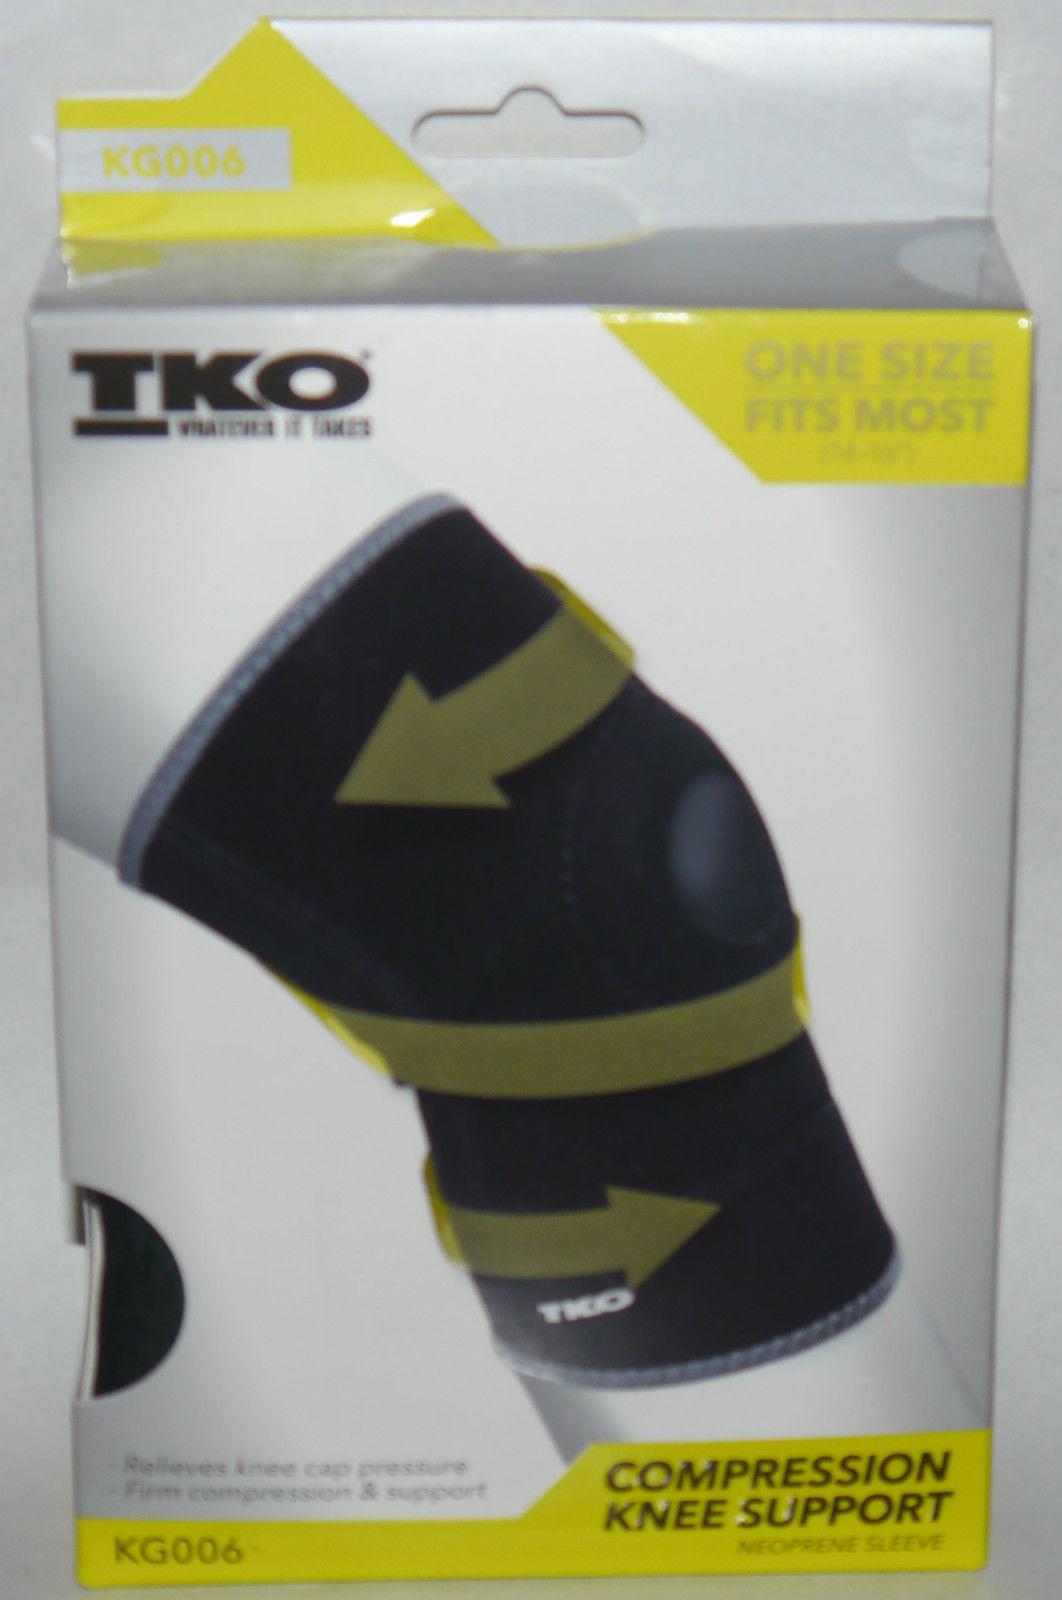 TKO Unisex Black/Gray Compression Knee Brace Neoprene Sleeve KG006 (One Size) 12634